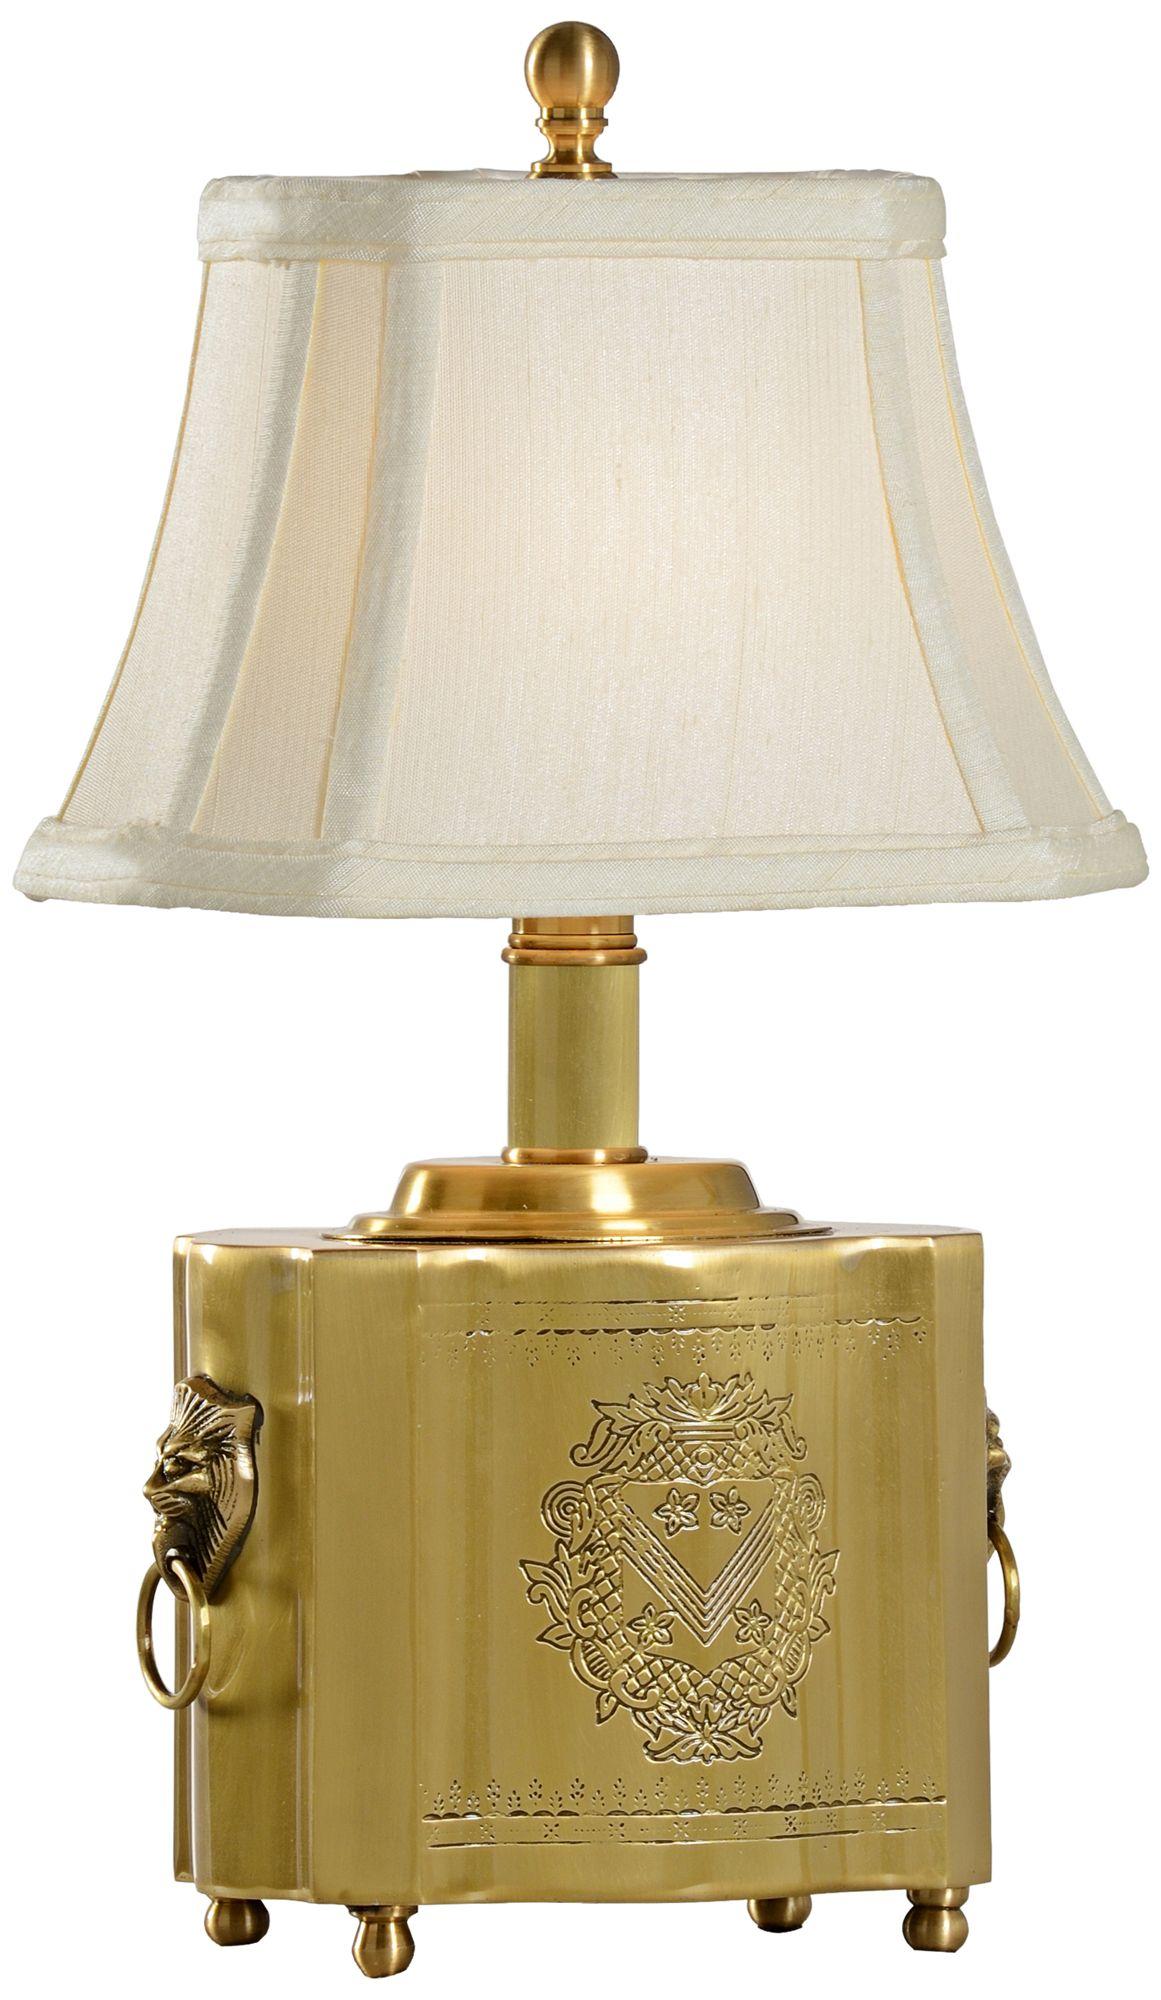 Wildwood Tea Box Antique Patina Solid Brass Table Lamp